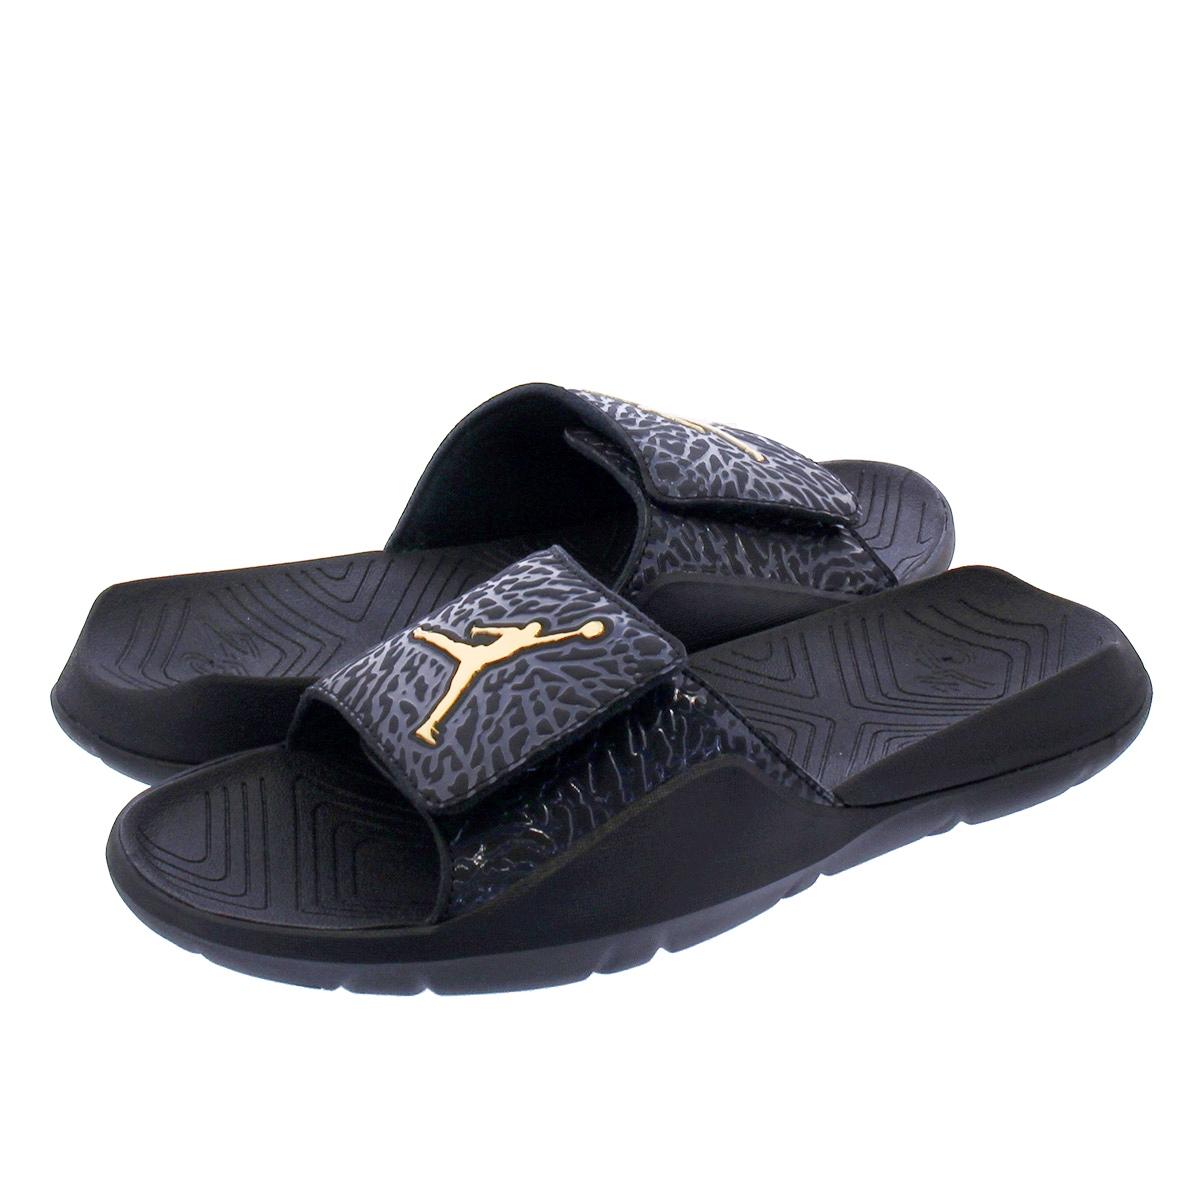 Nike Jordan Hydro 7 V2 Black Metallic Gold BQ6290 007 Men/'s Sz 11 NEW!